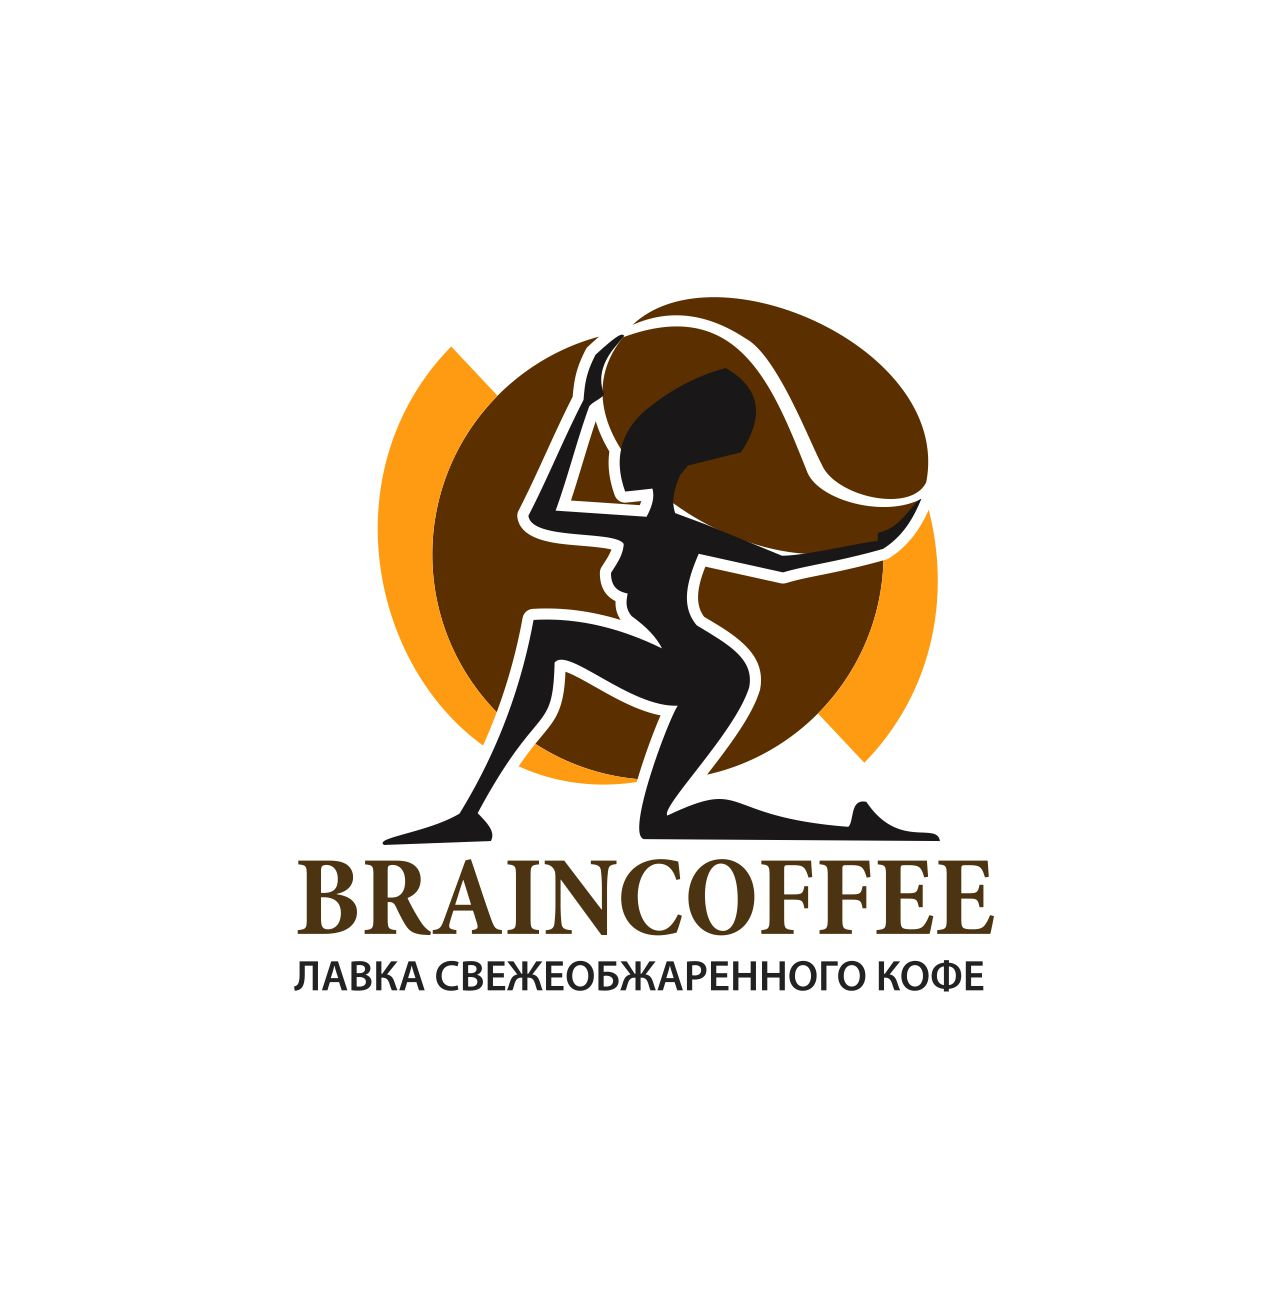 BrainCoffee